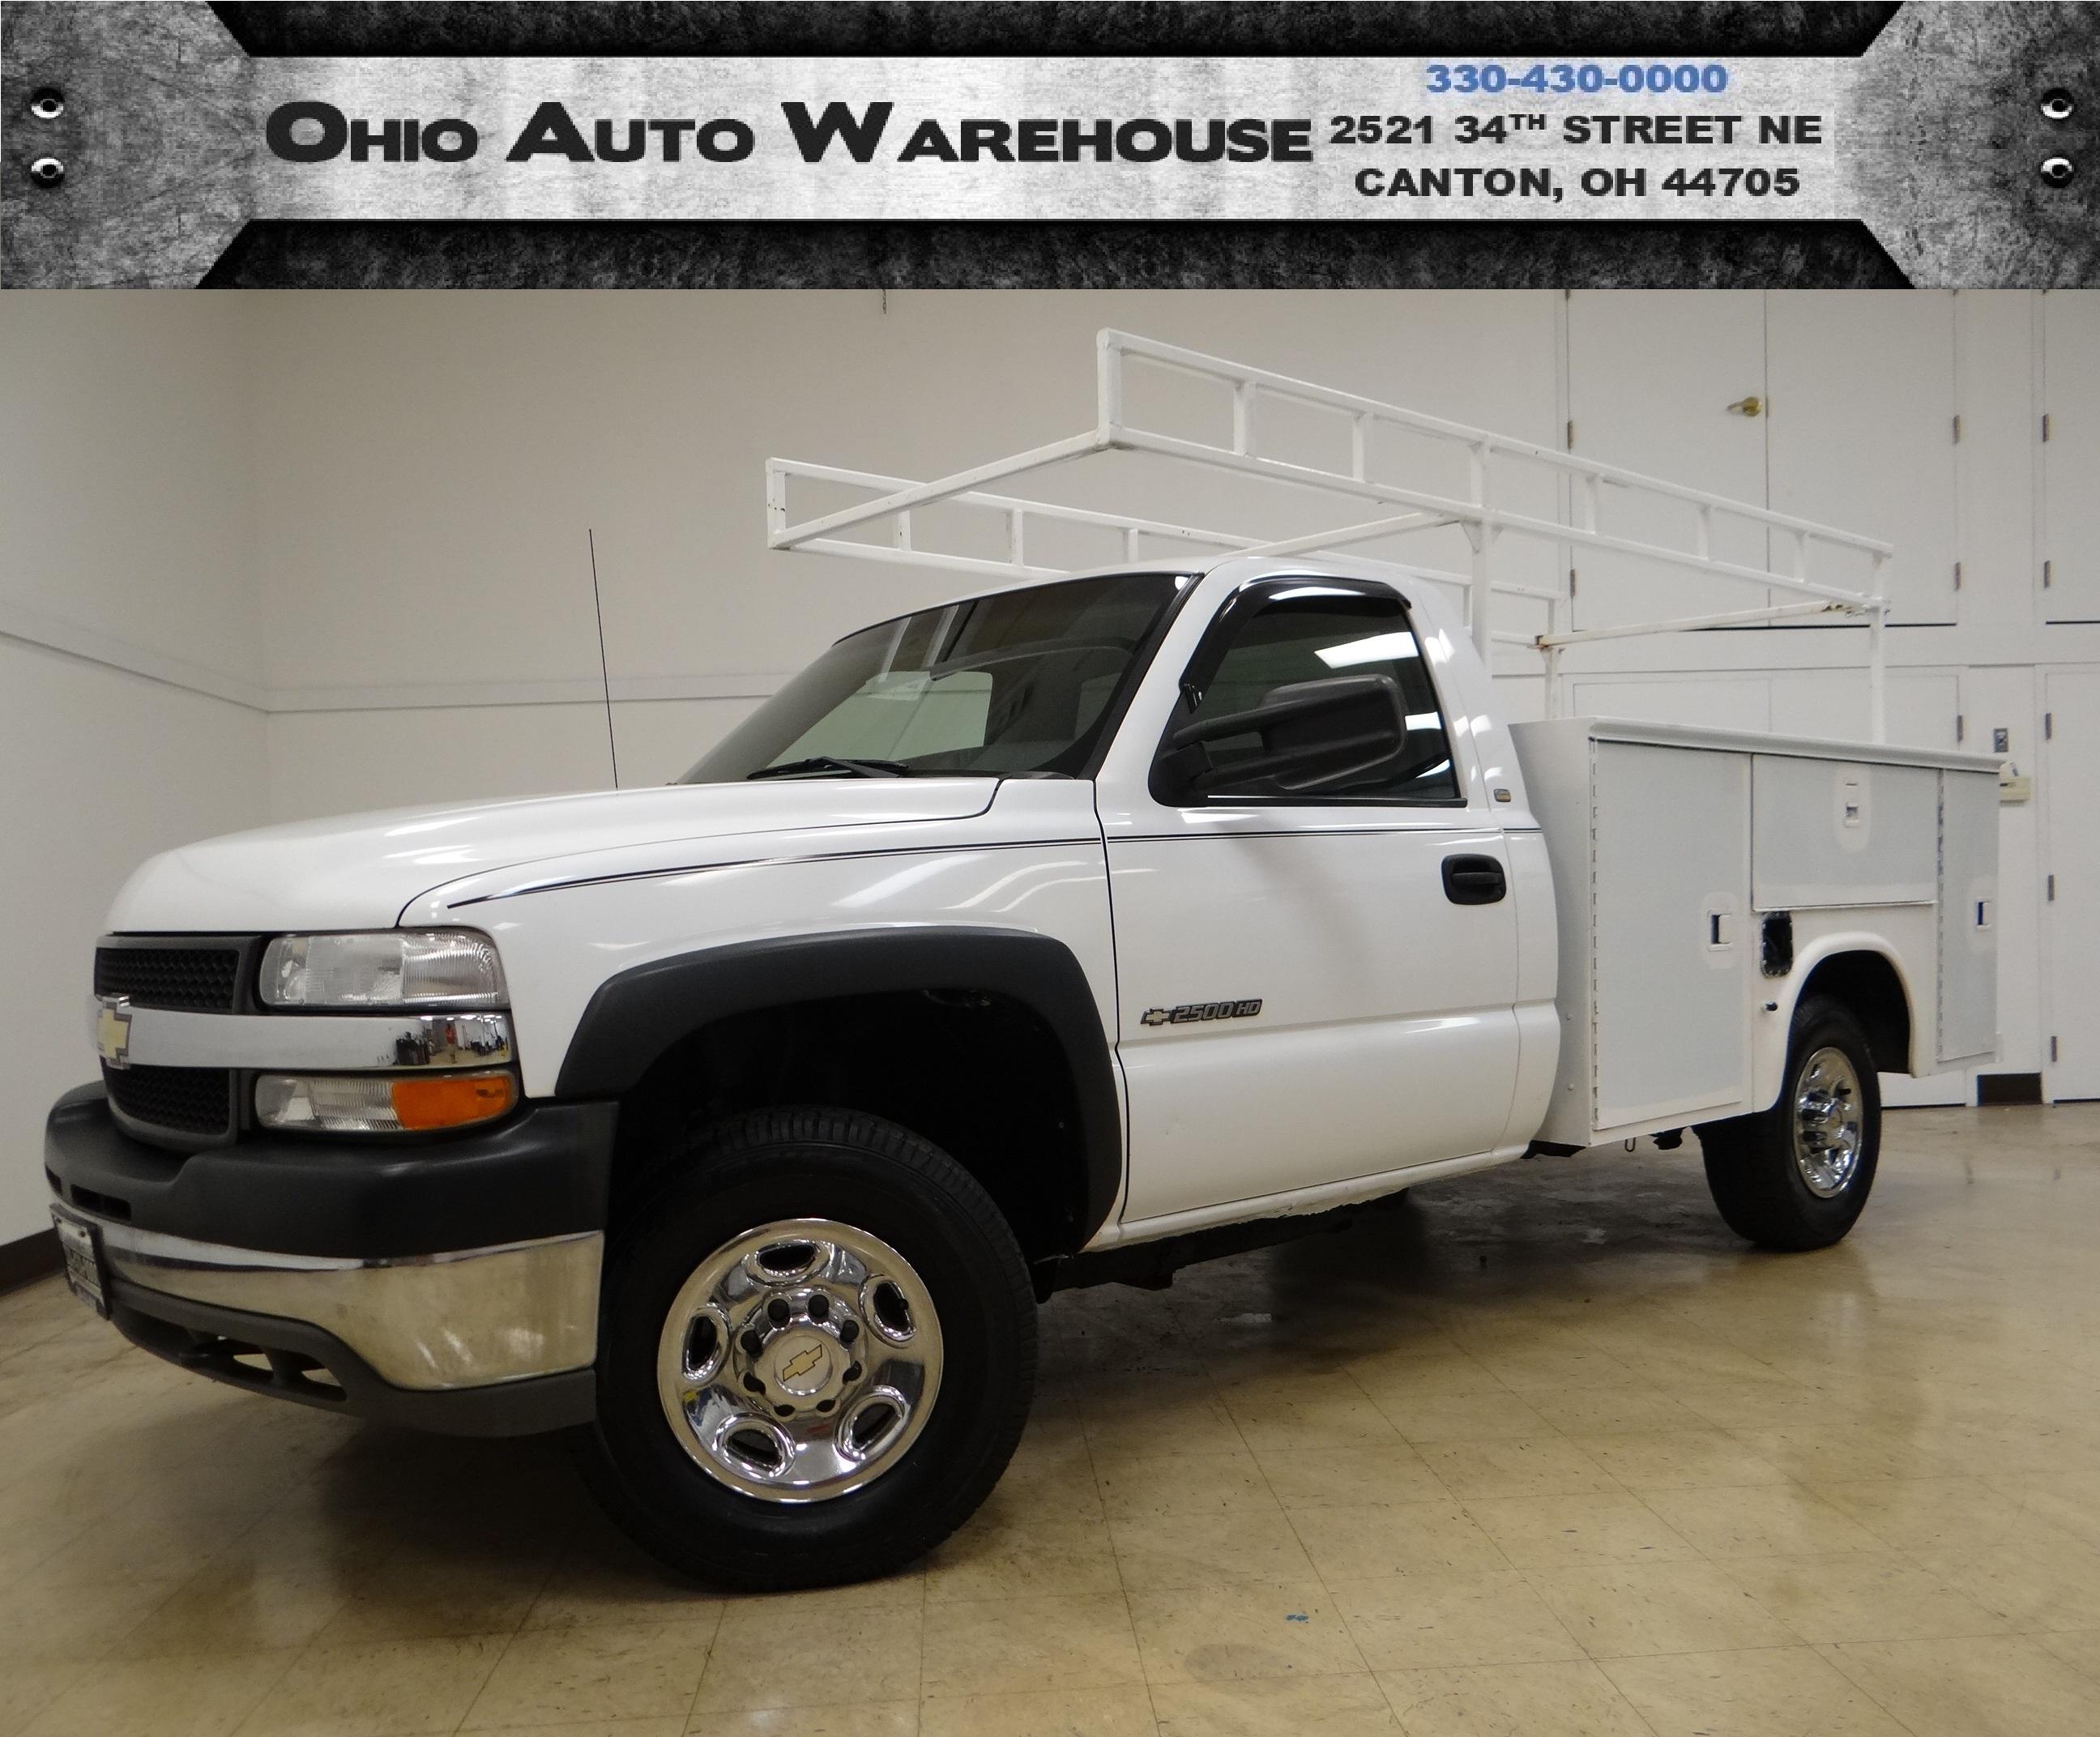 2002 Chevrolet Silverado 2500HD 4x4 8.1L V8 Utility Bed Cln Carfax We Finance in Canton Ohio